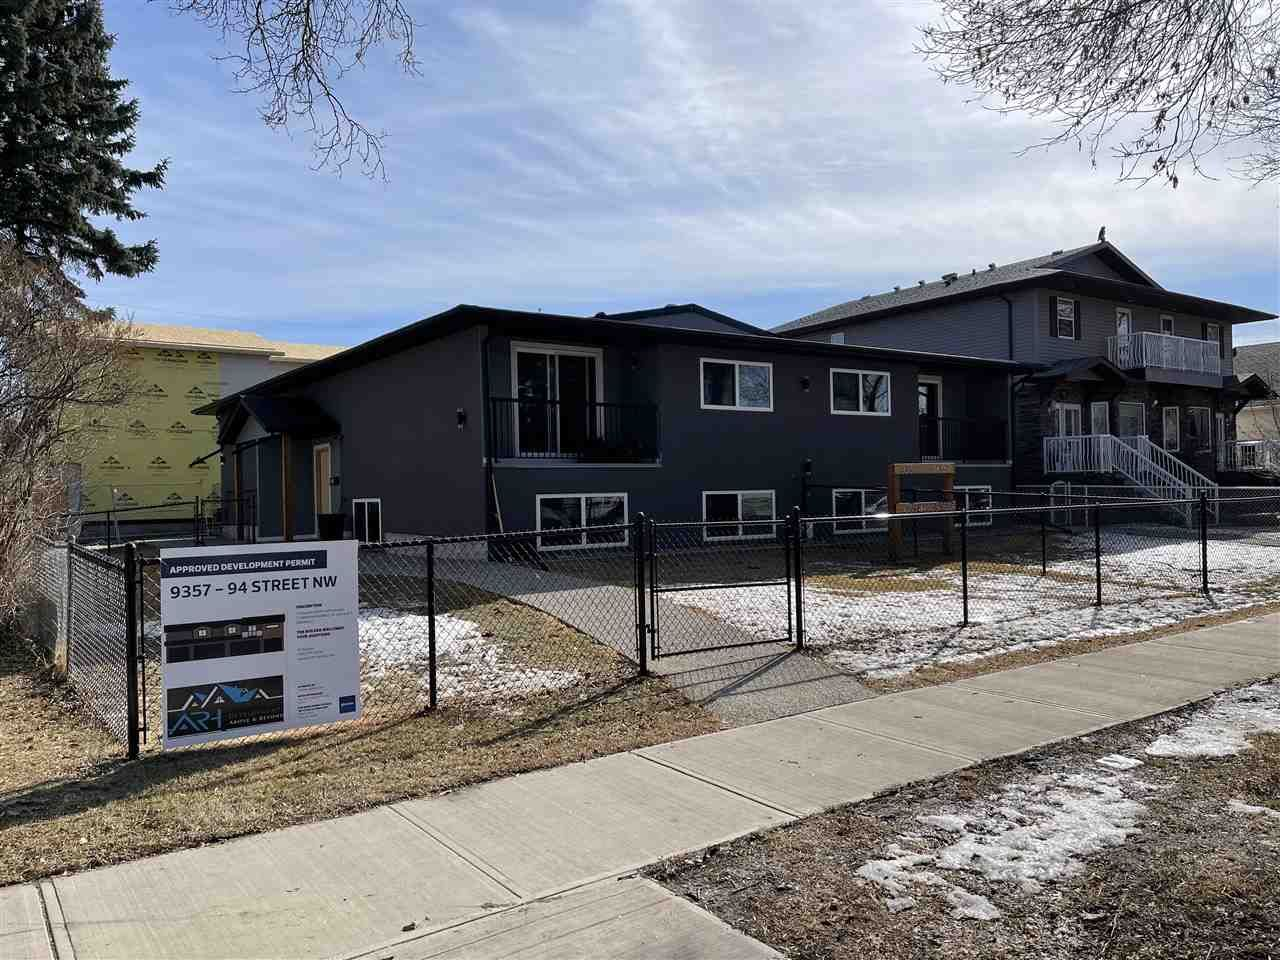 Main Photo: 9357 94 Street in Edmonton: Zone 18 Multi-Family Commercial for sale : MLS®# E4233121